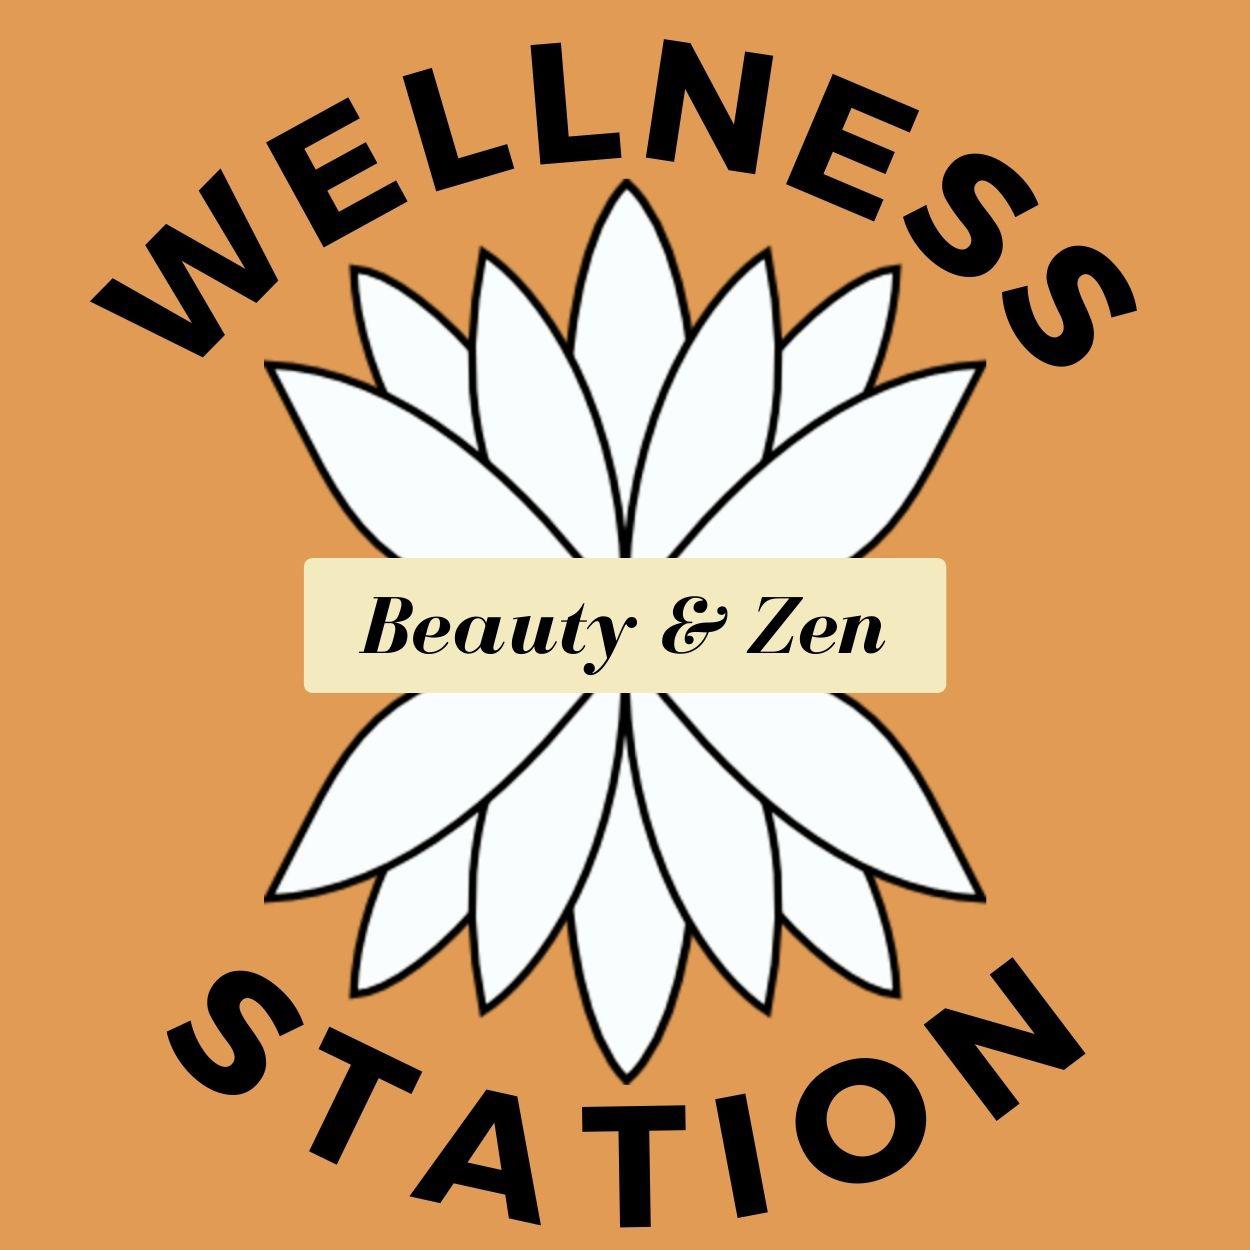 wellness station